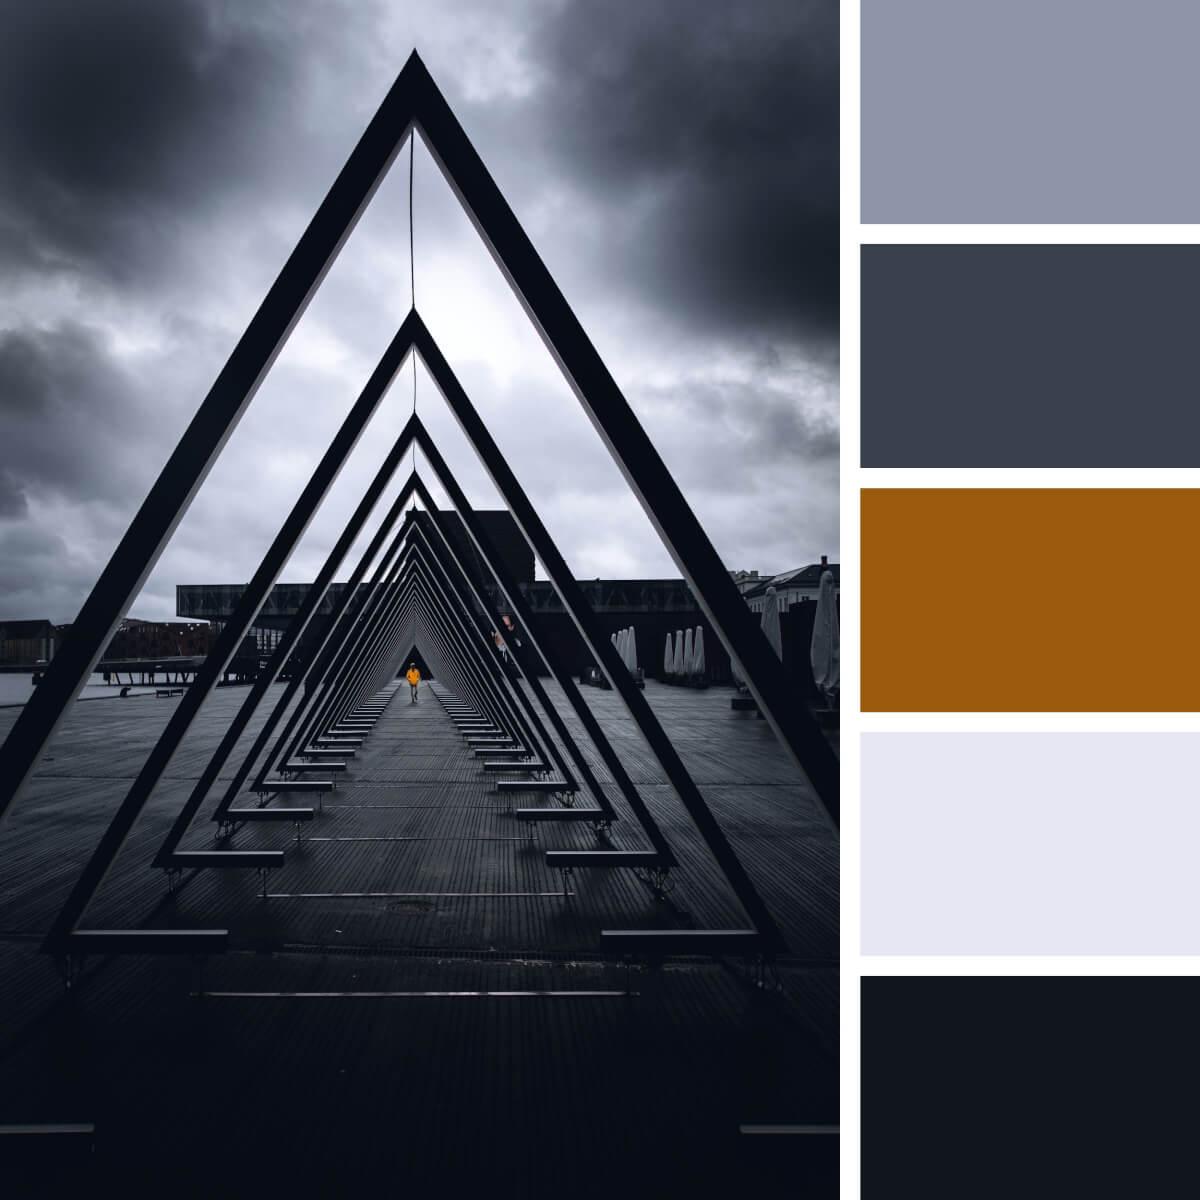 Cinematic Gray & Black